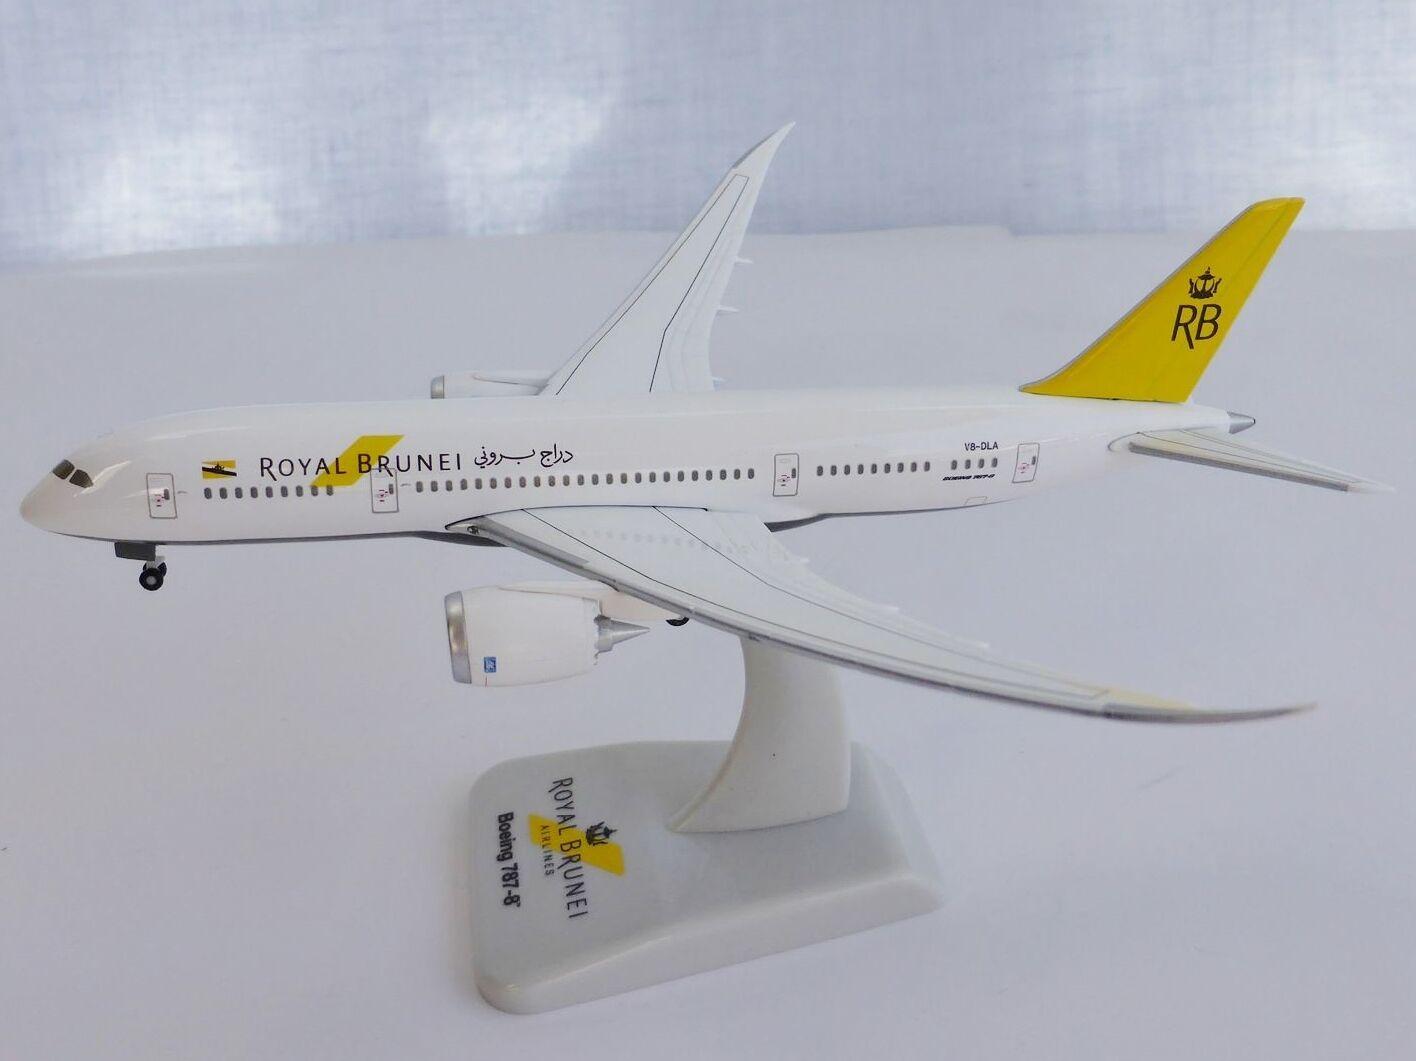 Boeing 787-8 Royal Brunei Airlines 1 400 Hogan Wings 5385 787 v8-dla